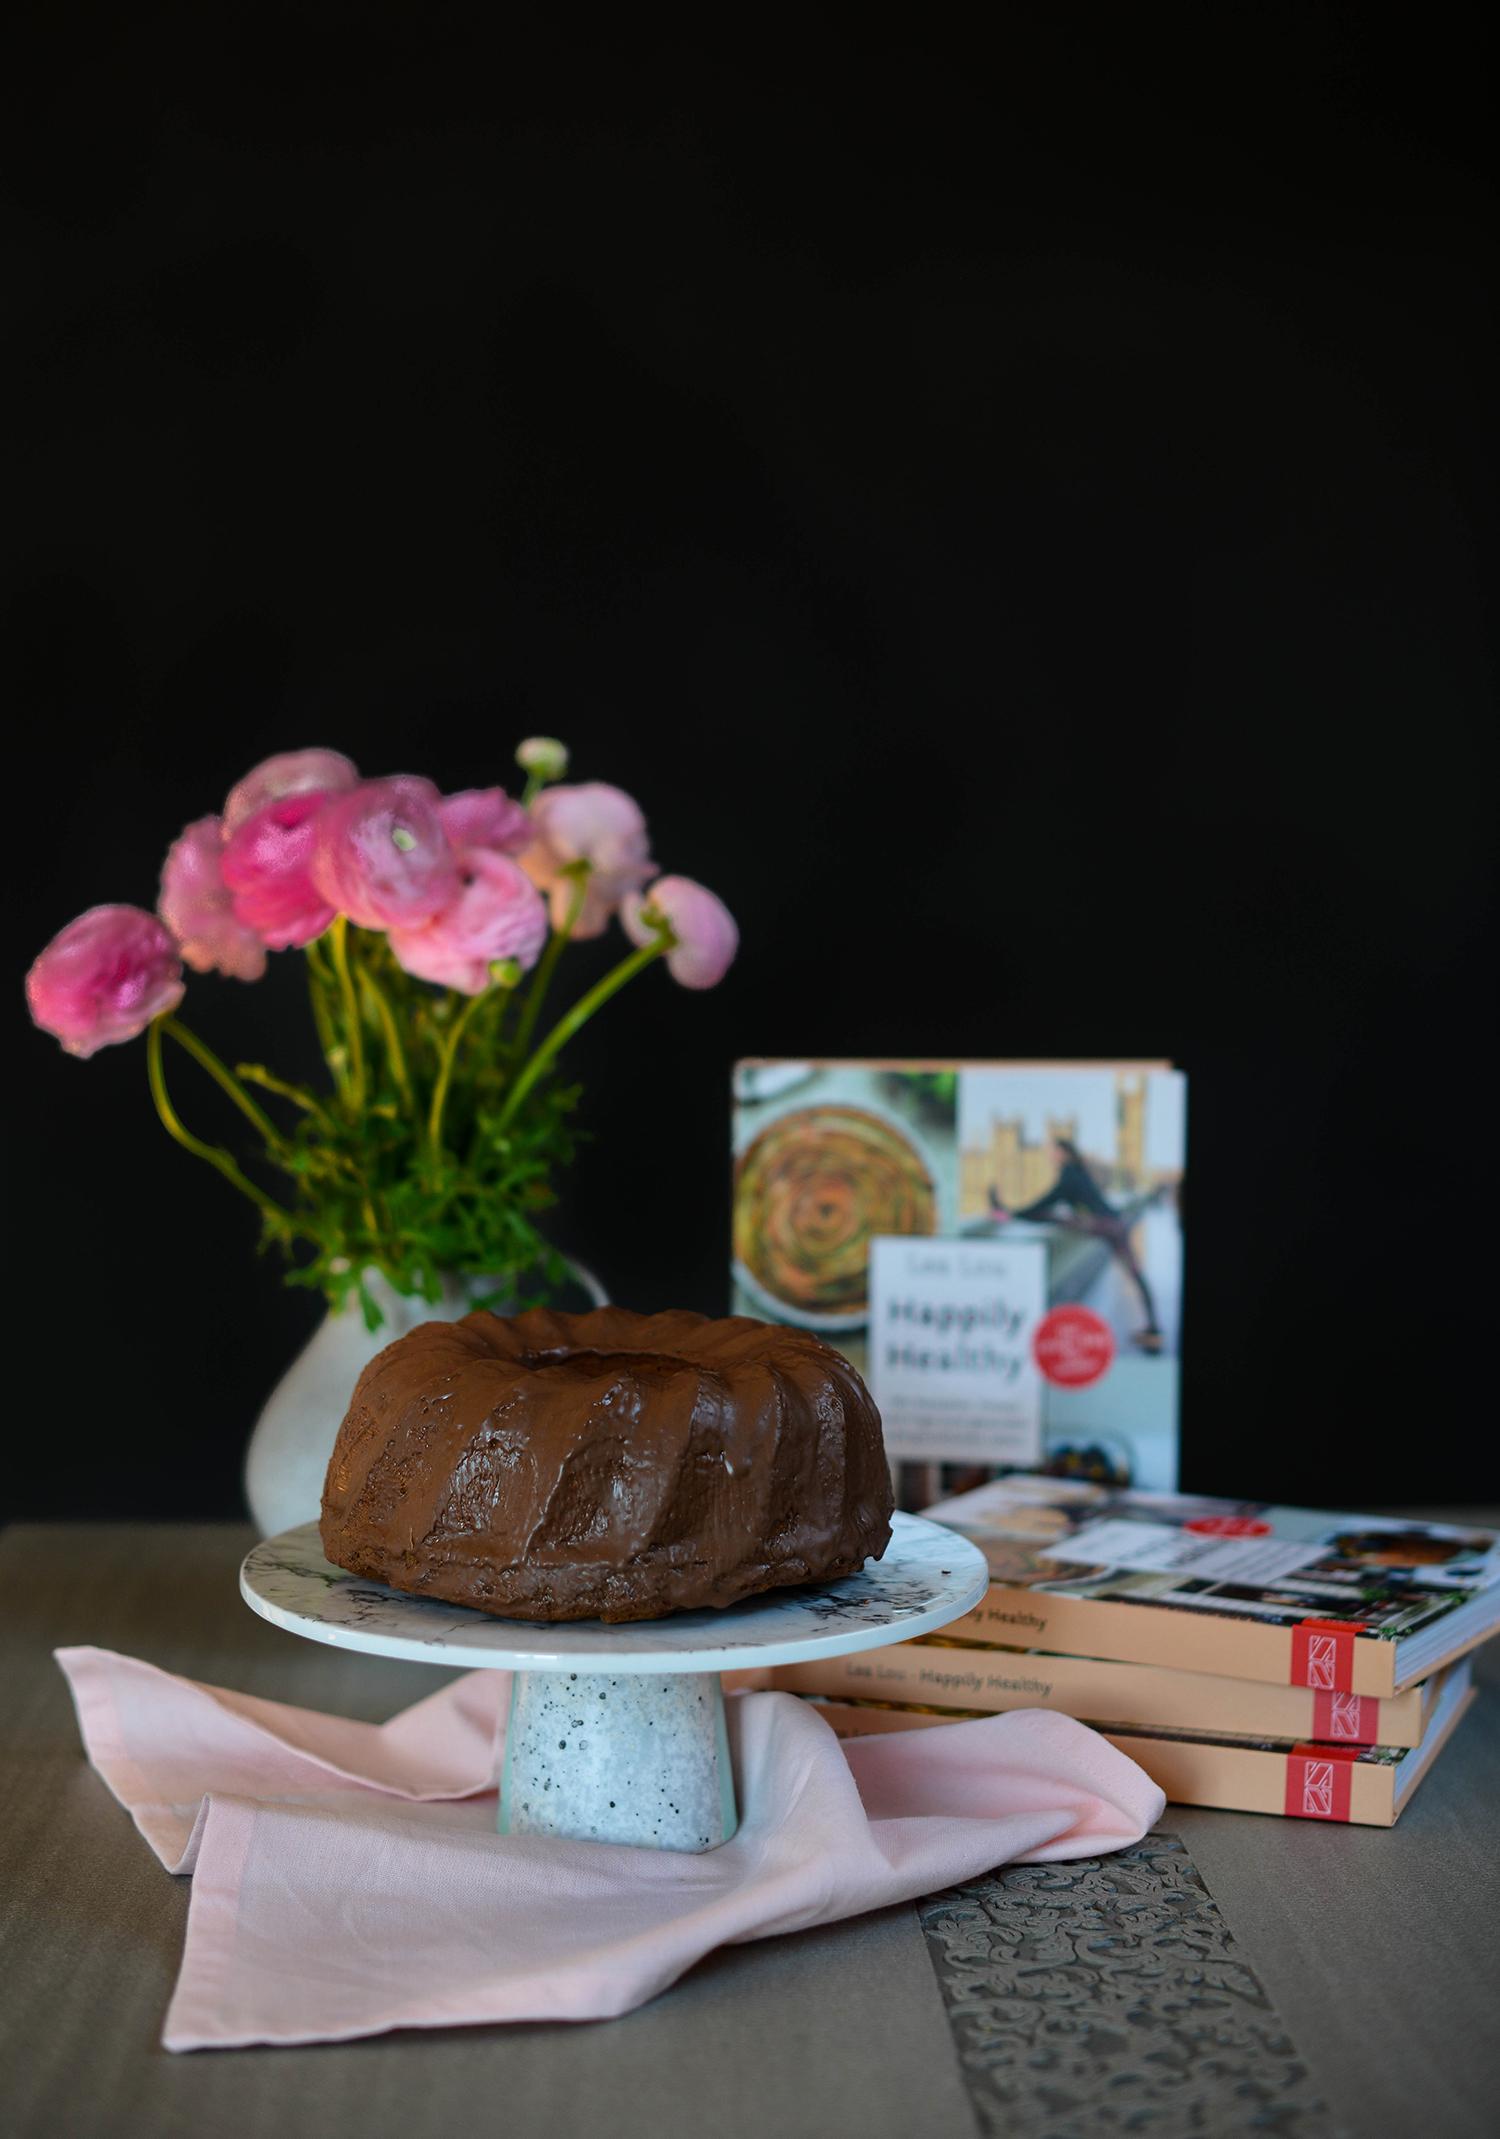 Chocolate-walnut-gugelhupf-lea-lou-3